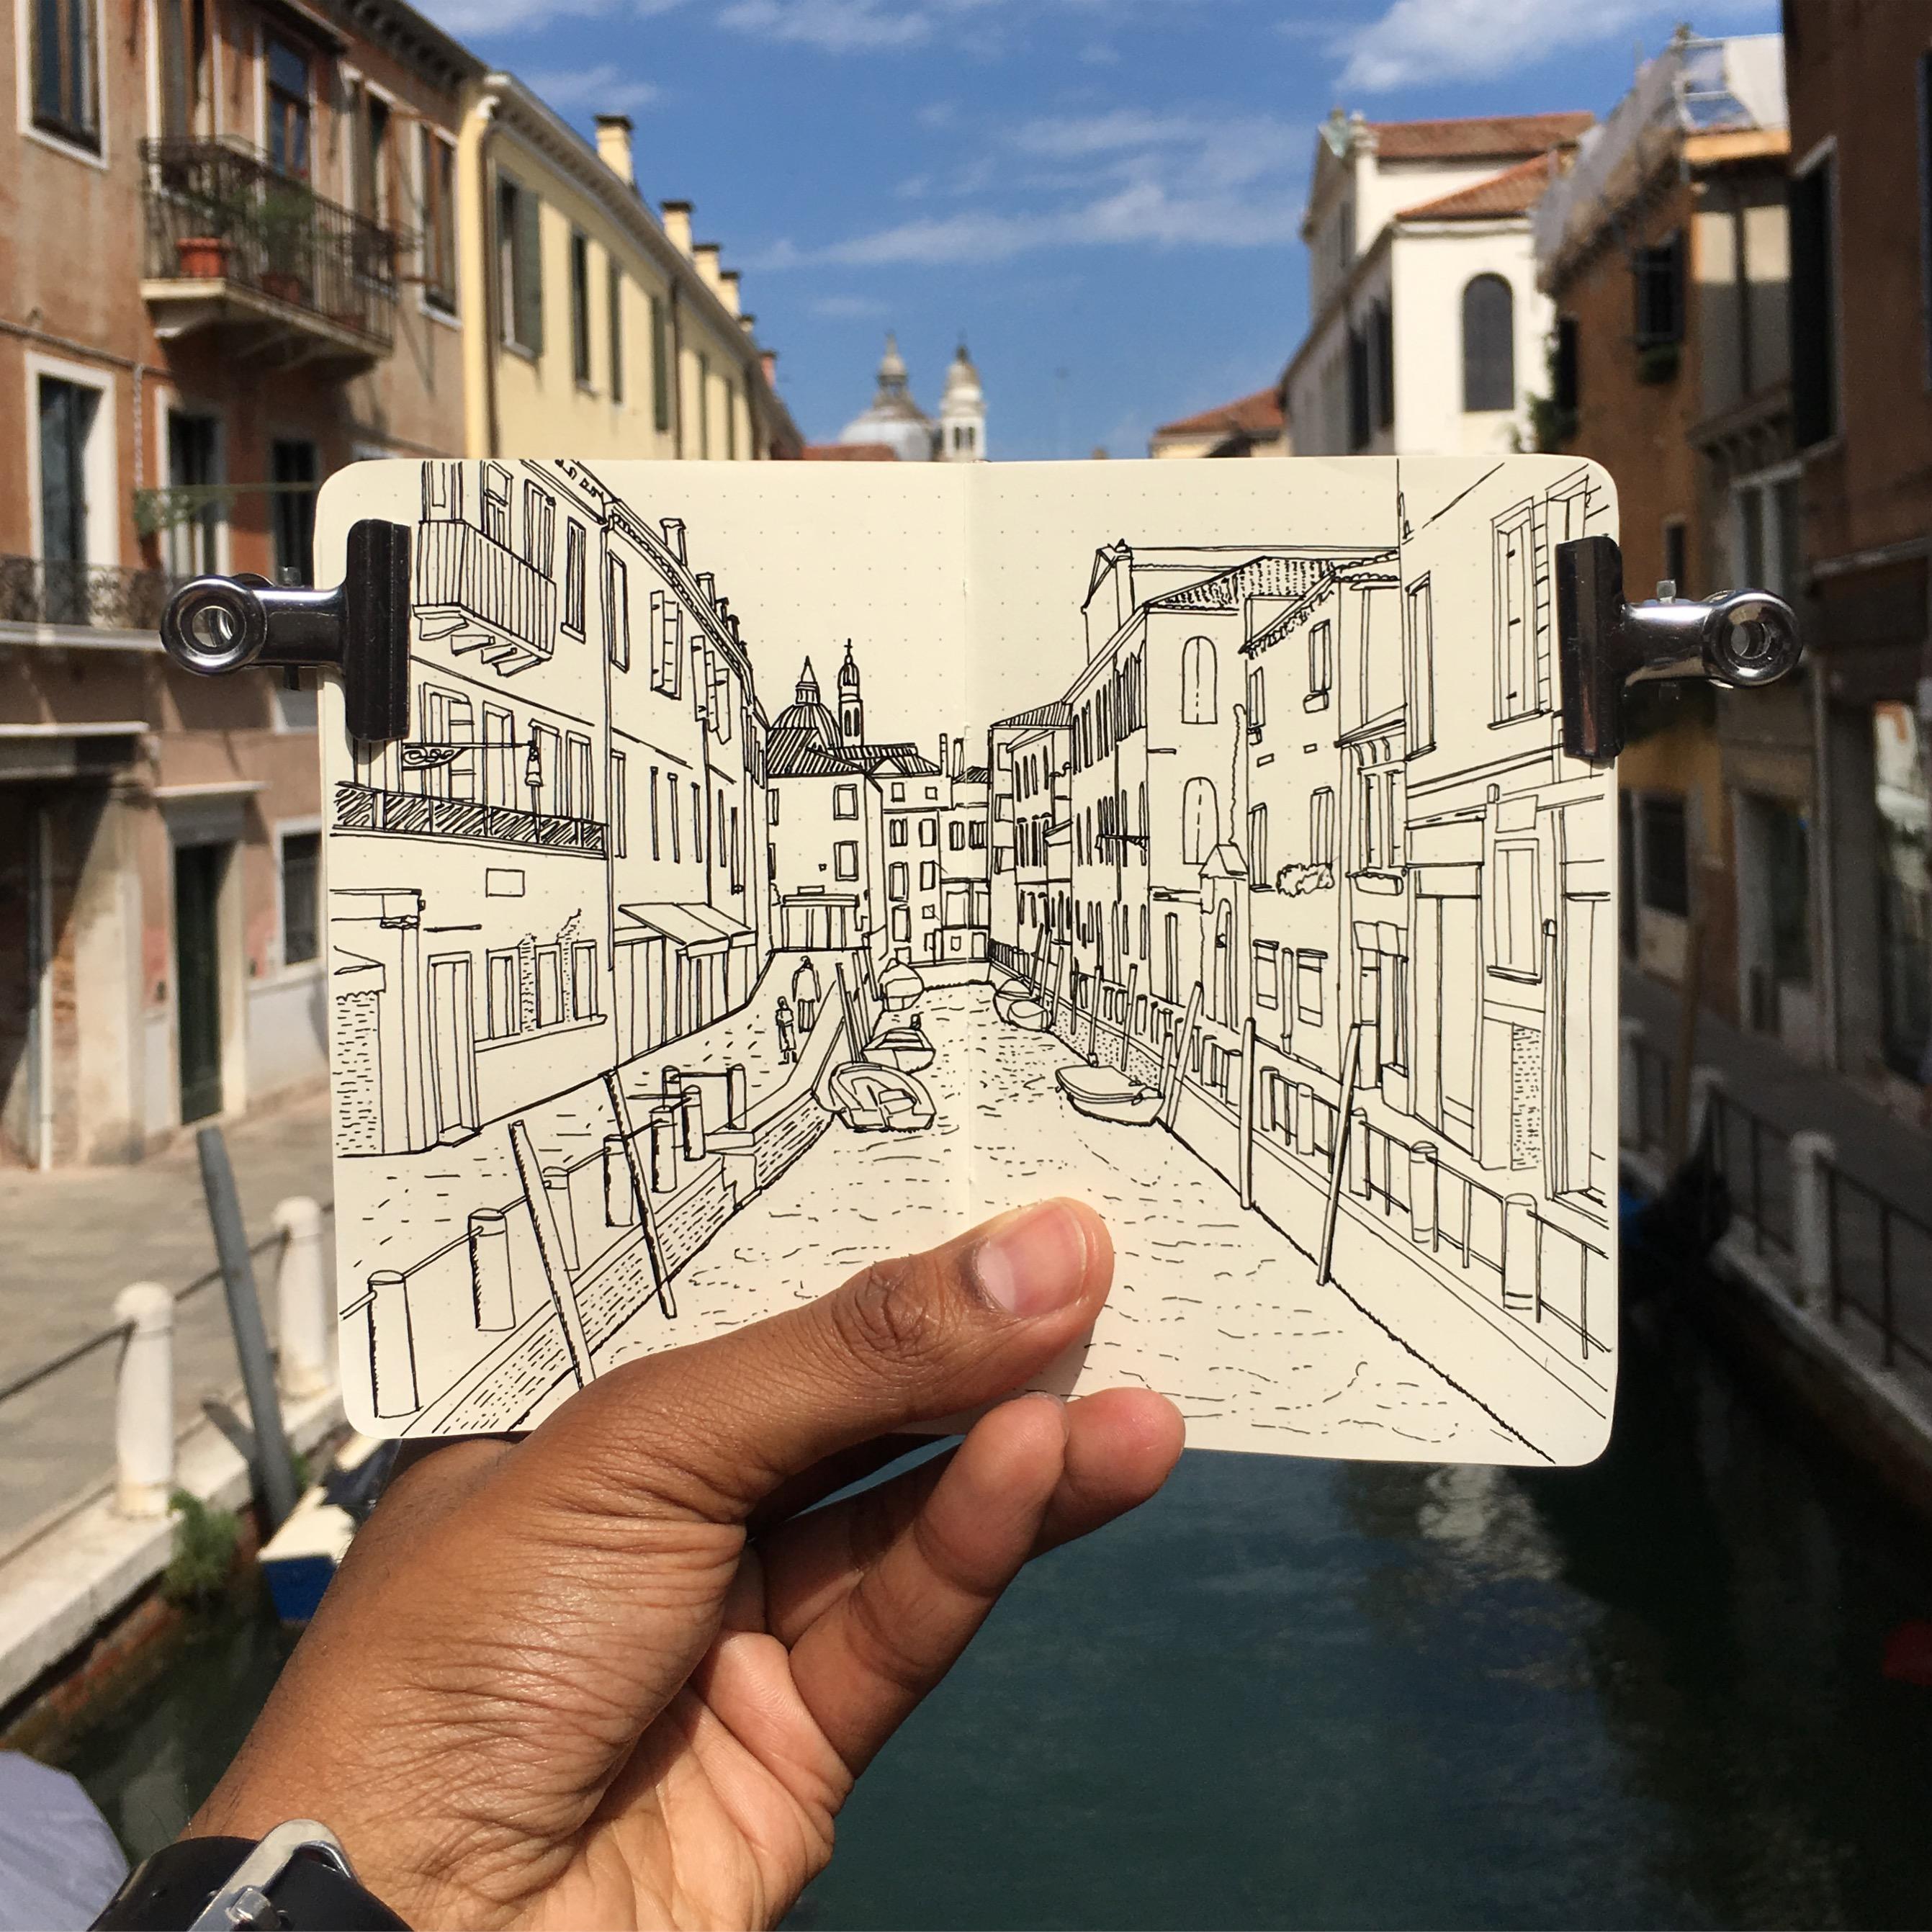 Moleskine Sketchbook Drawing of Venice, Italy